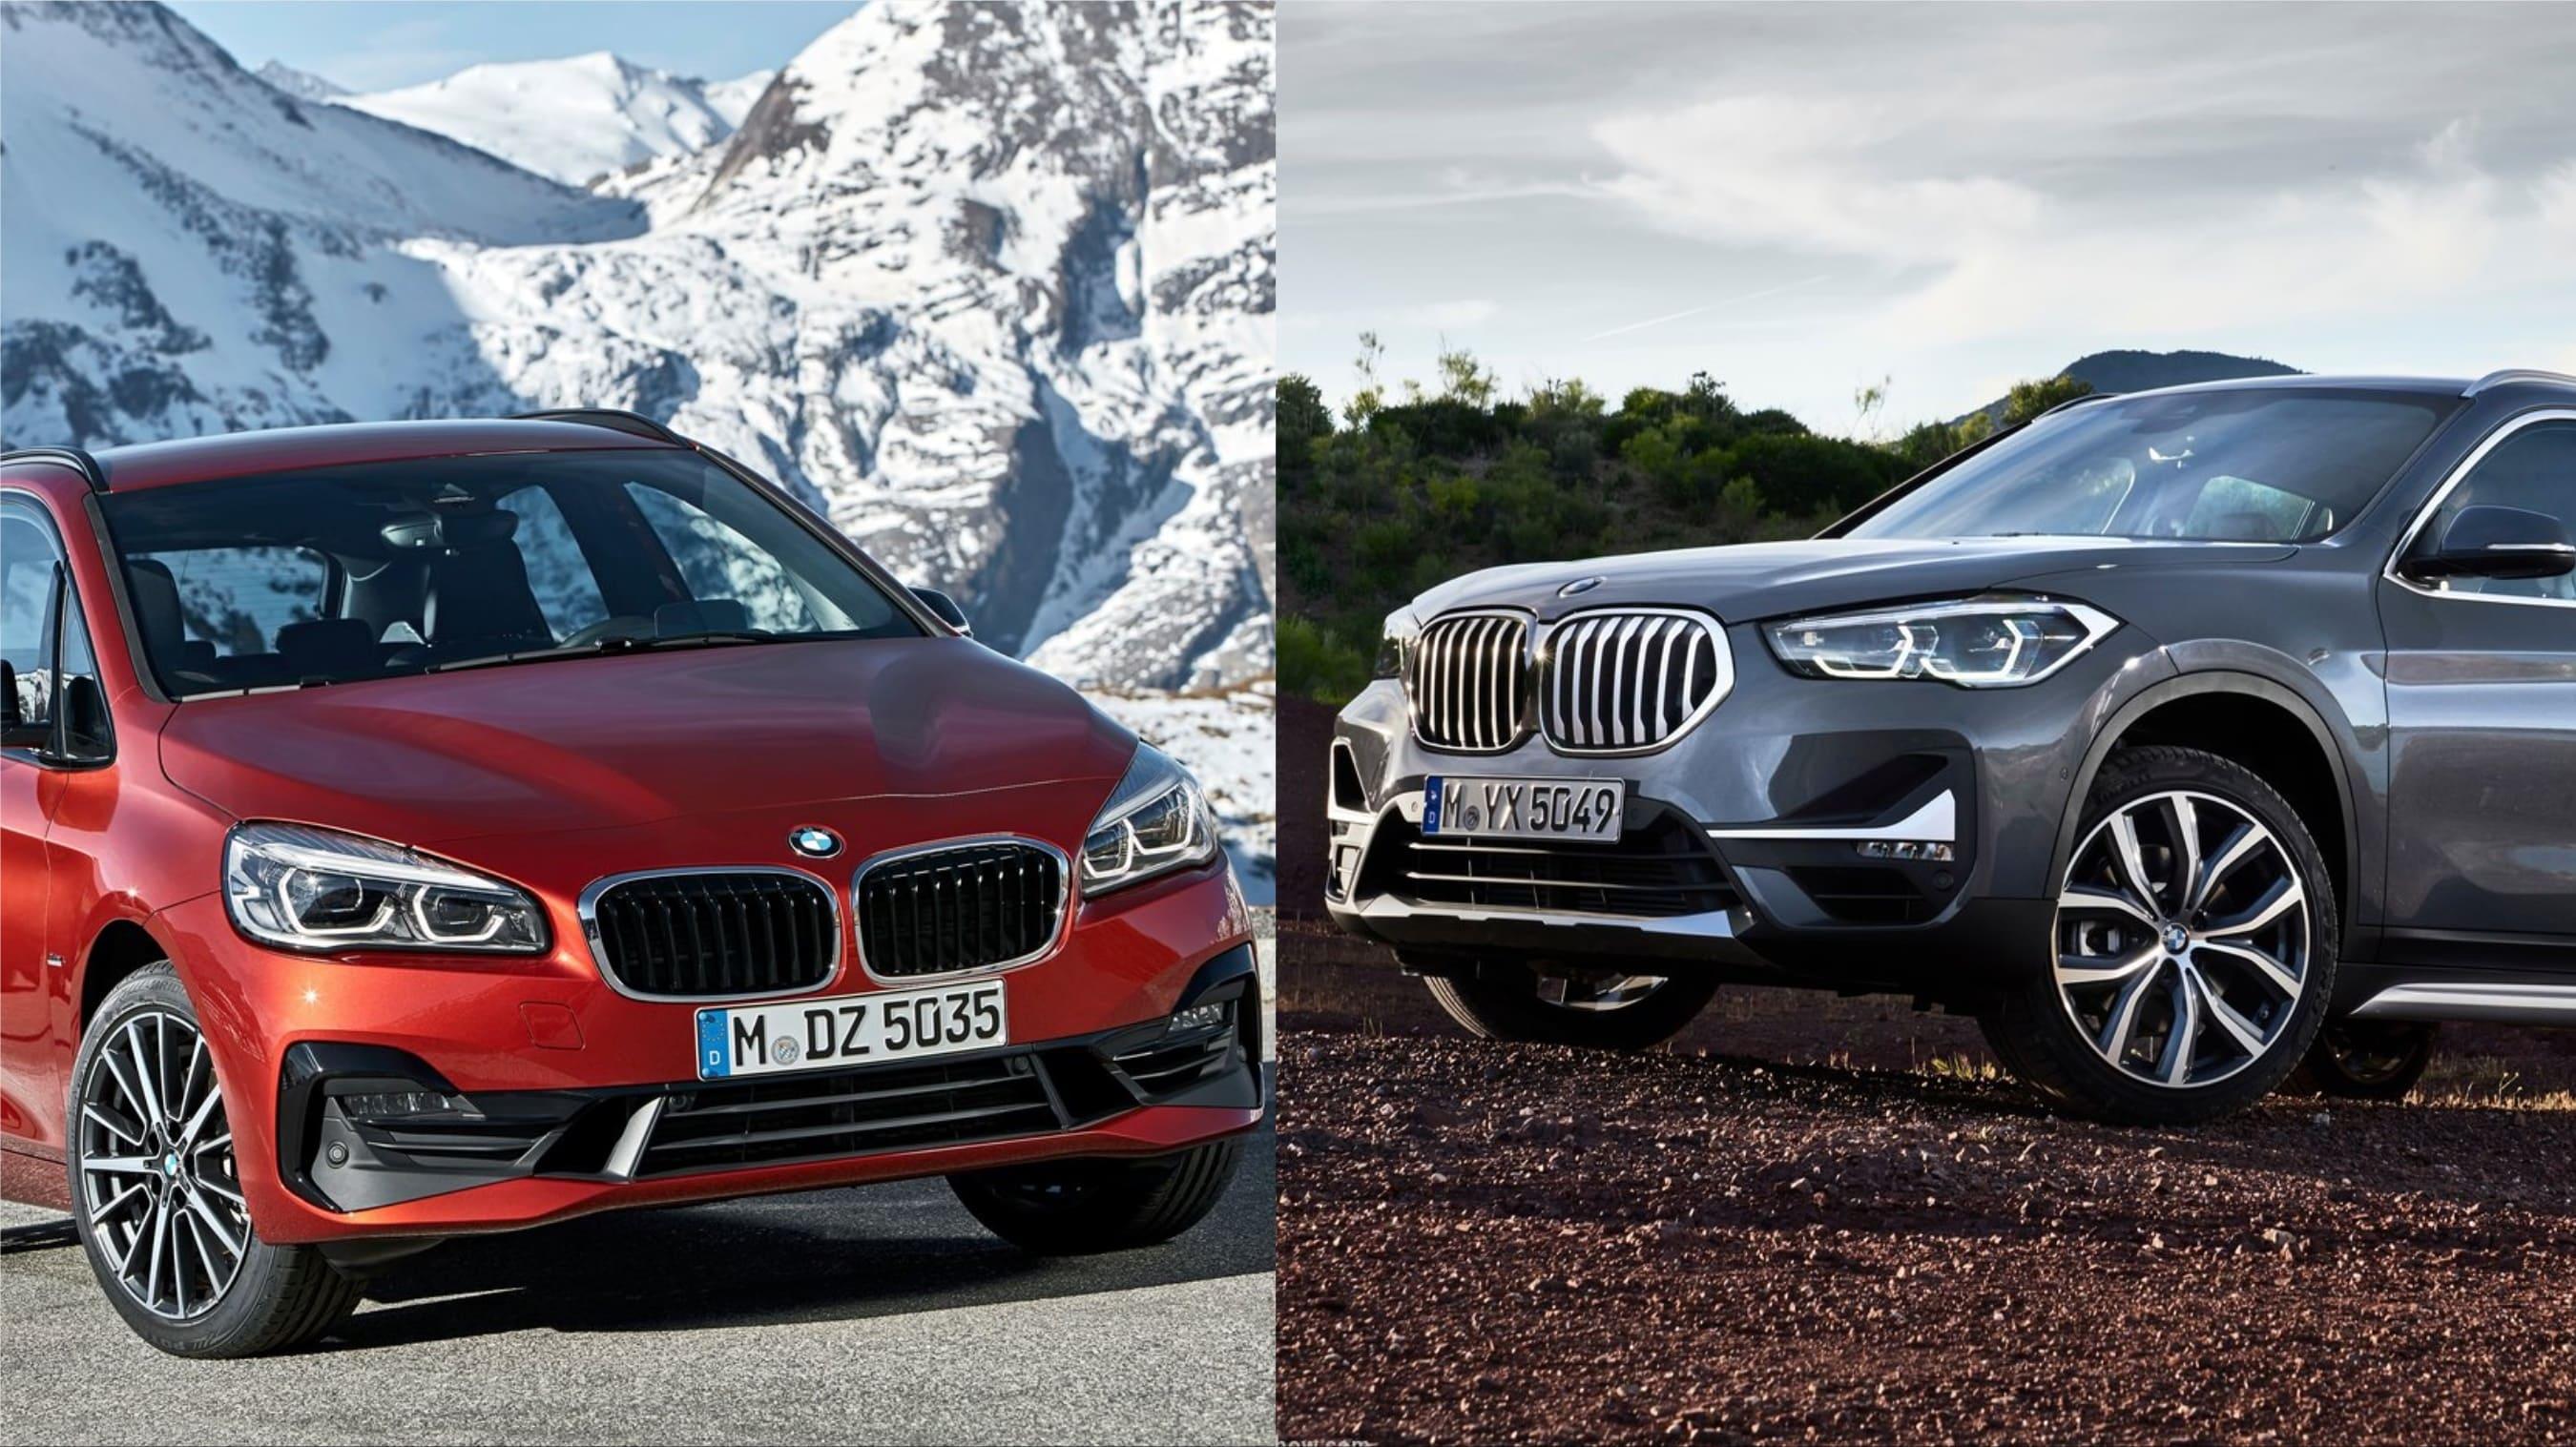 BMW X1 VS BMW Serie 2 Active Tourer